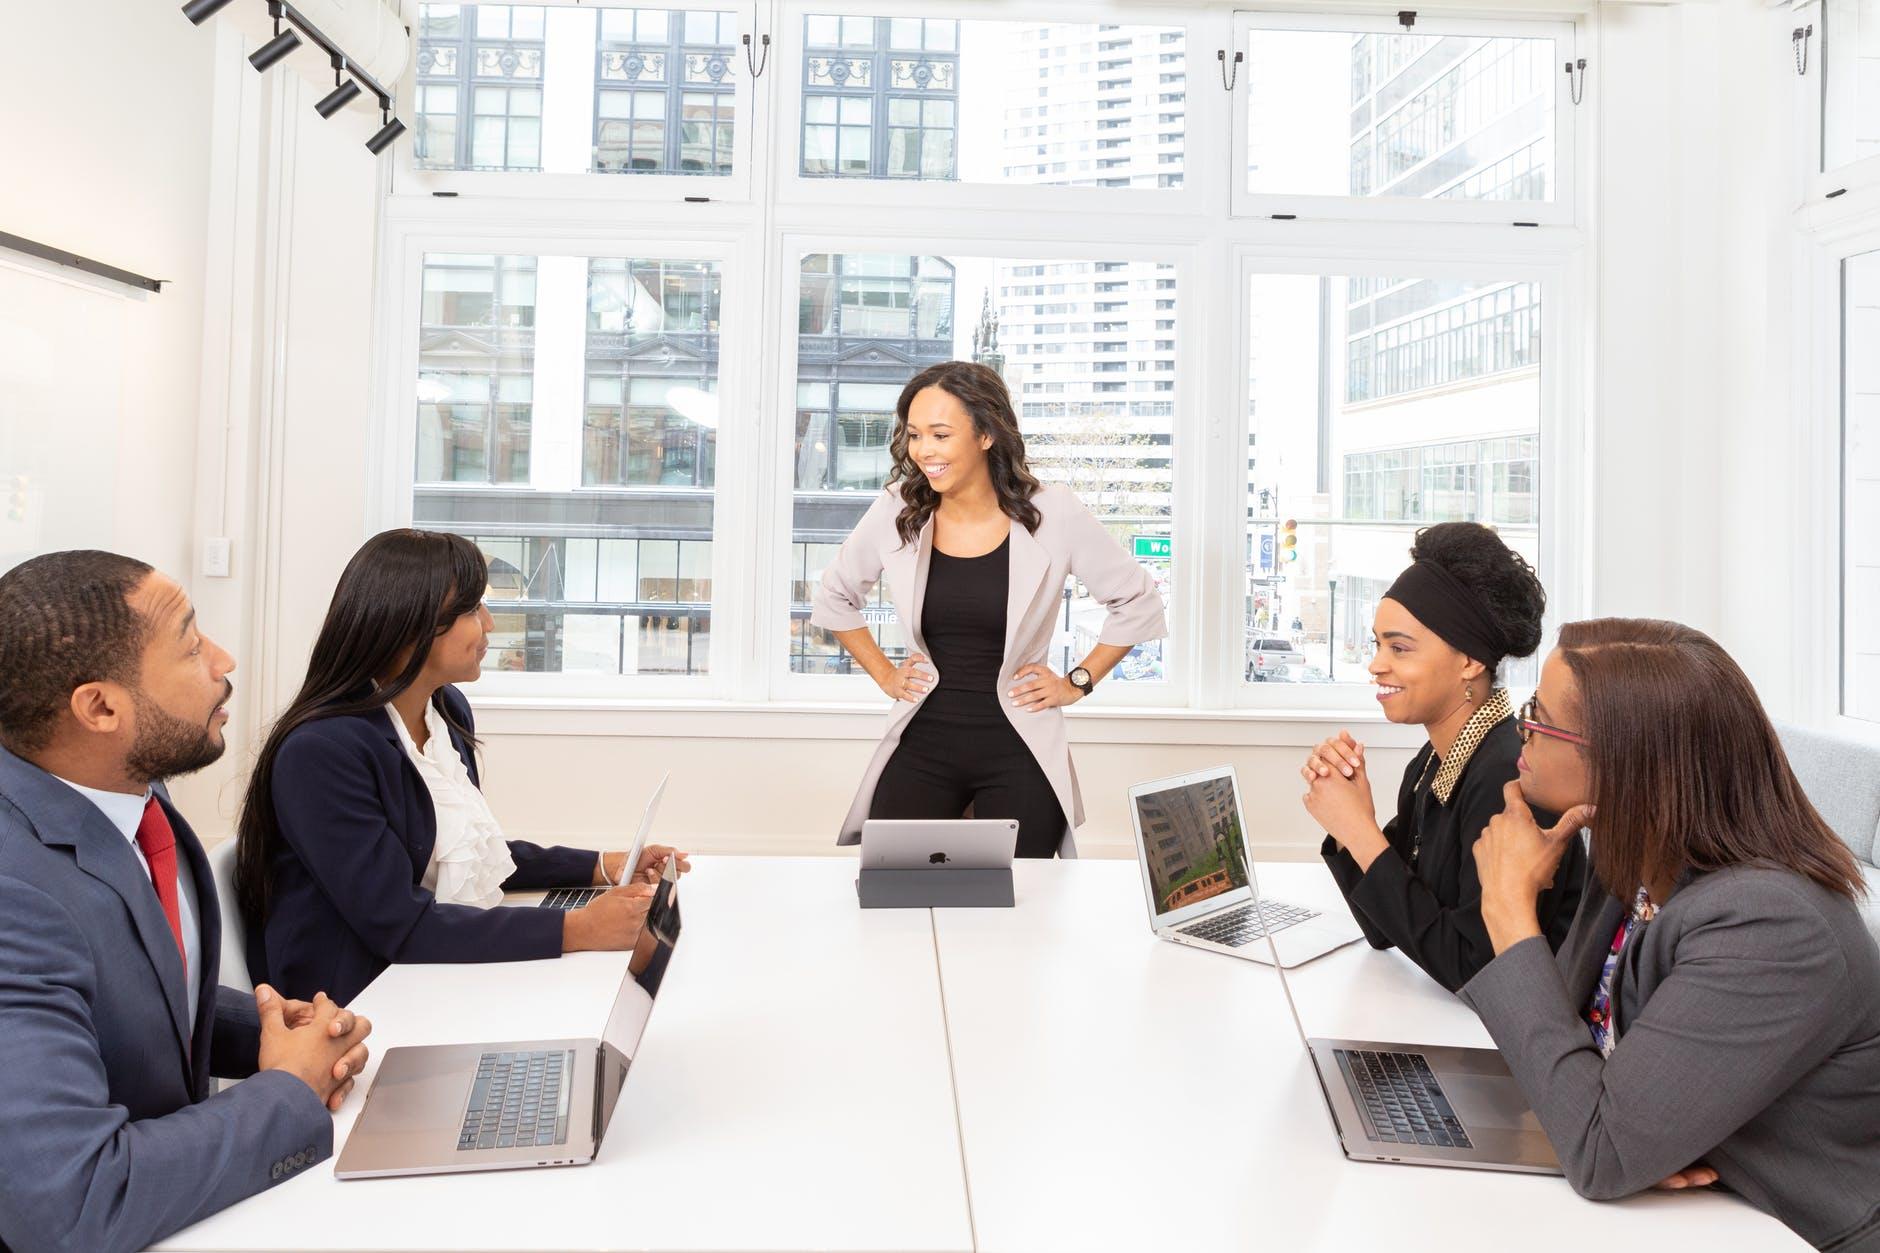 Office Productivity image